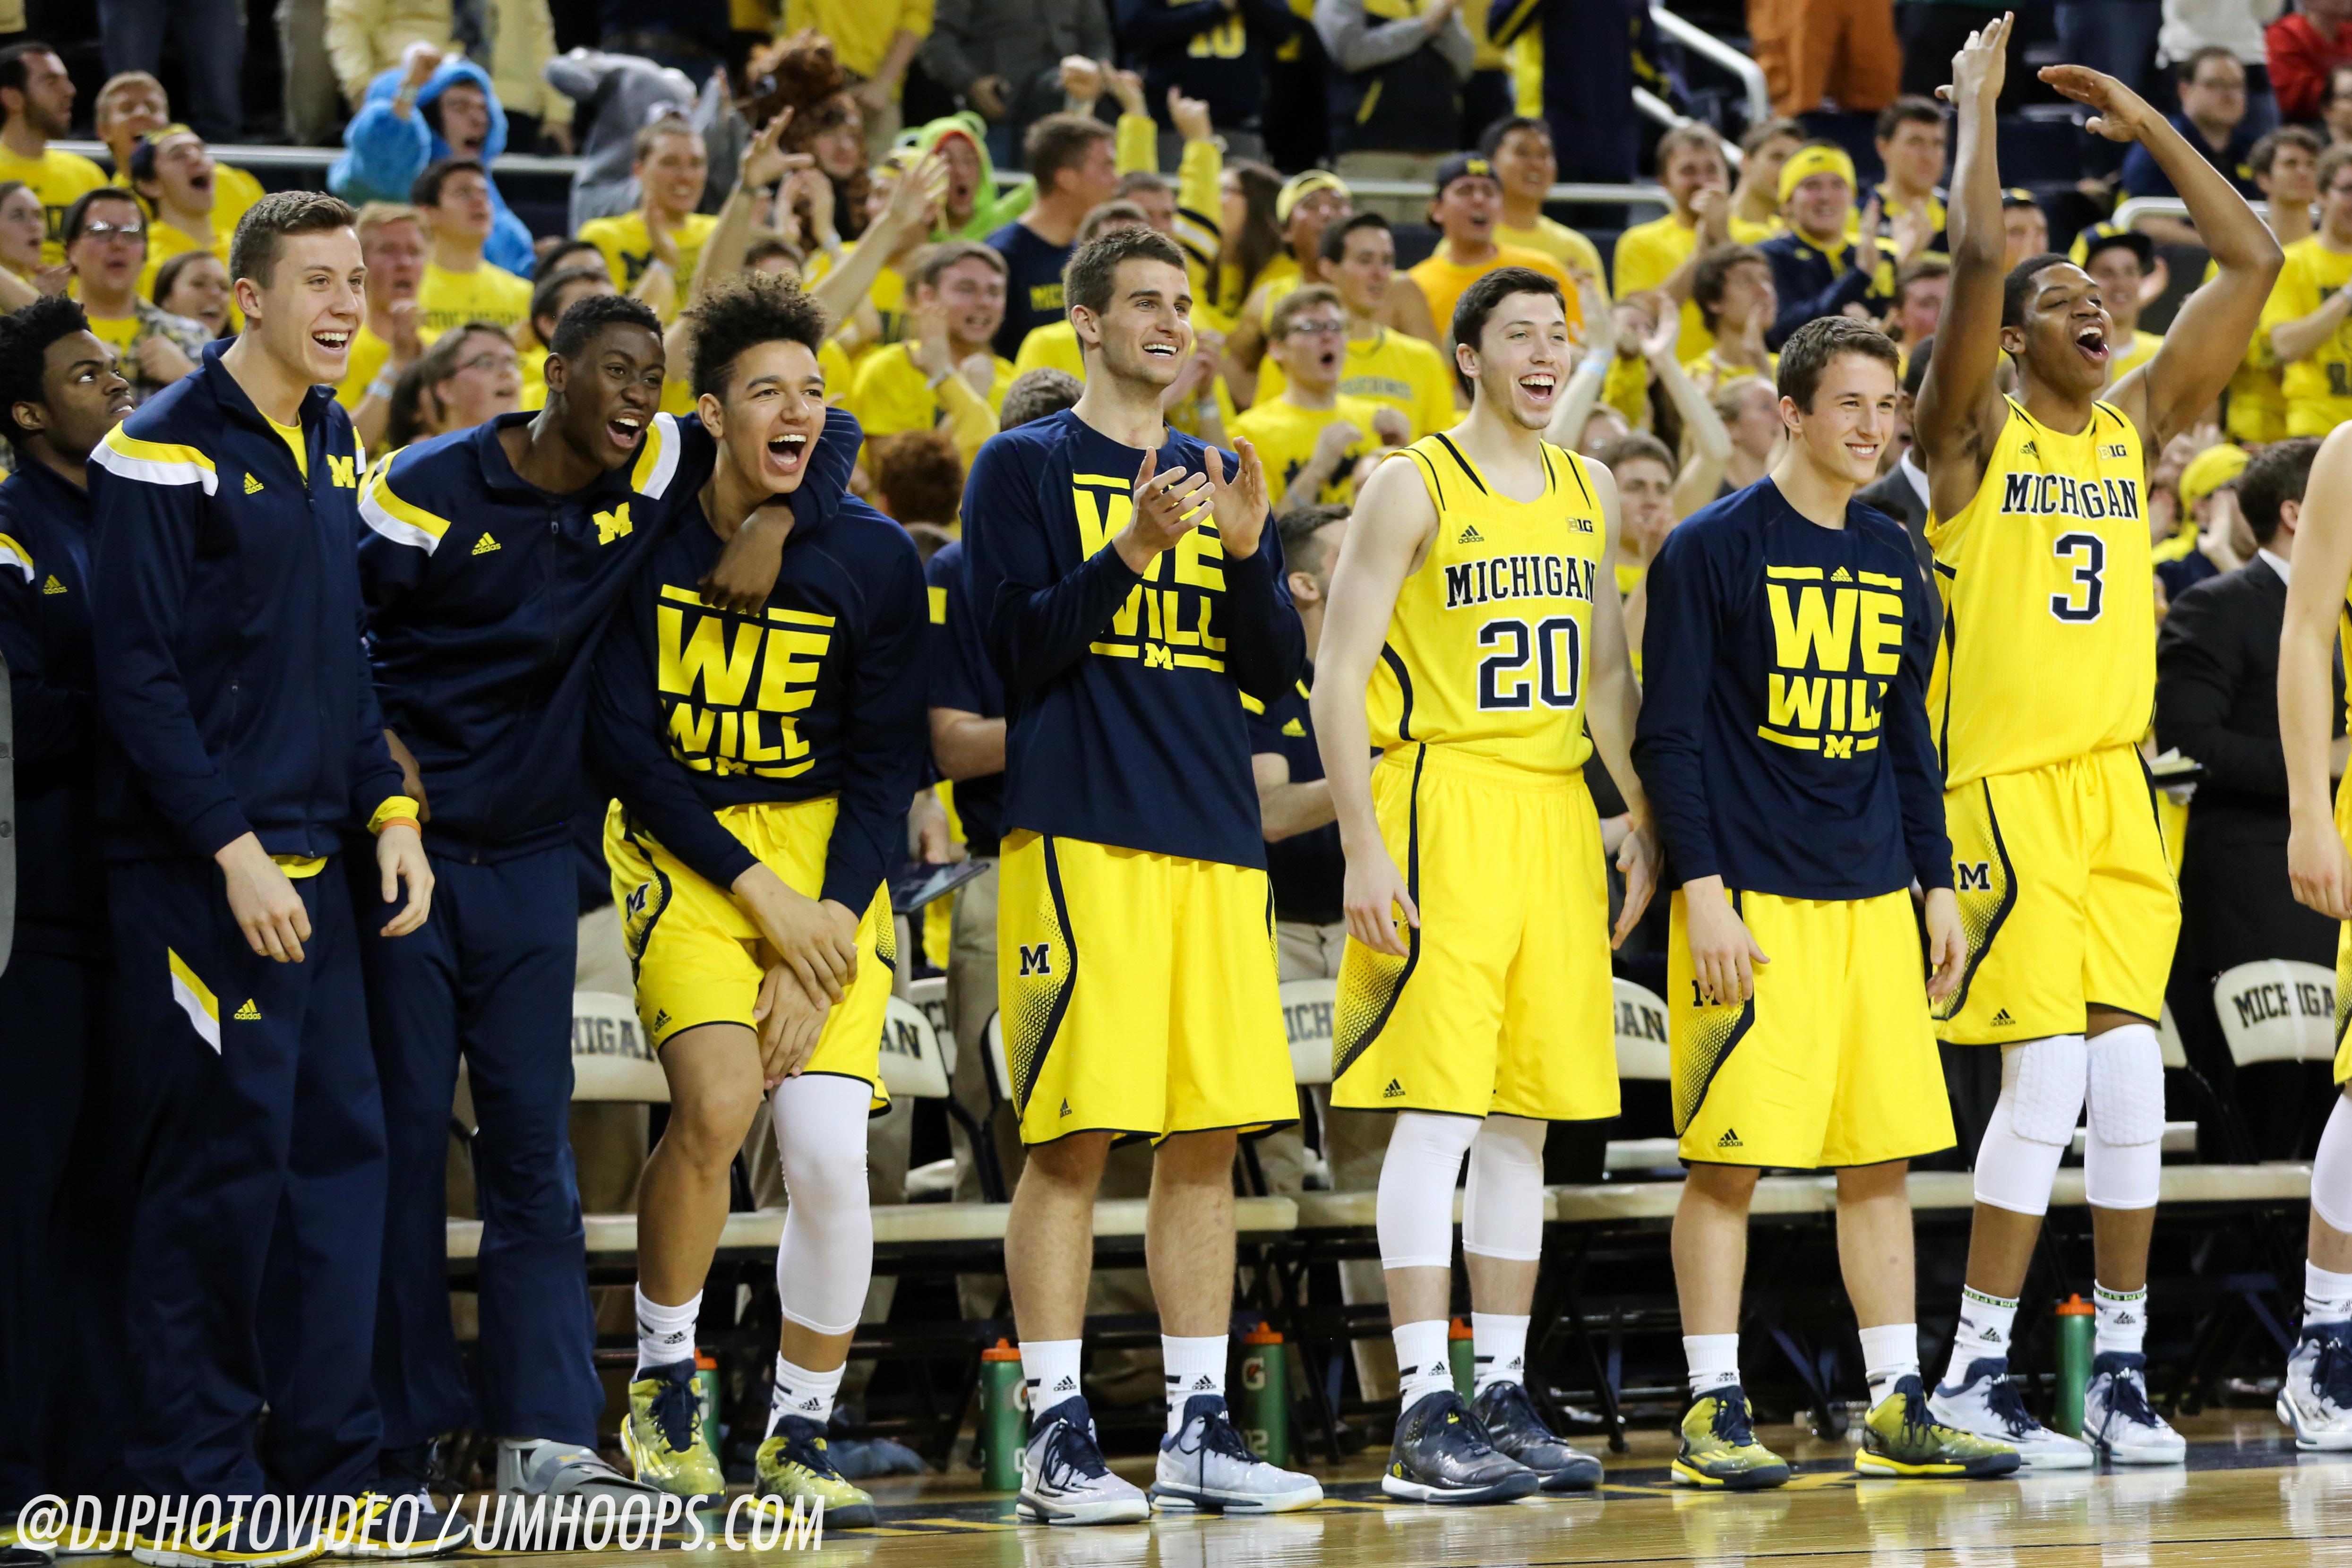 Michigan 64, Ohio State 57-28